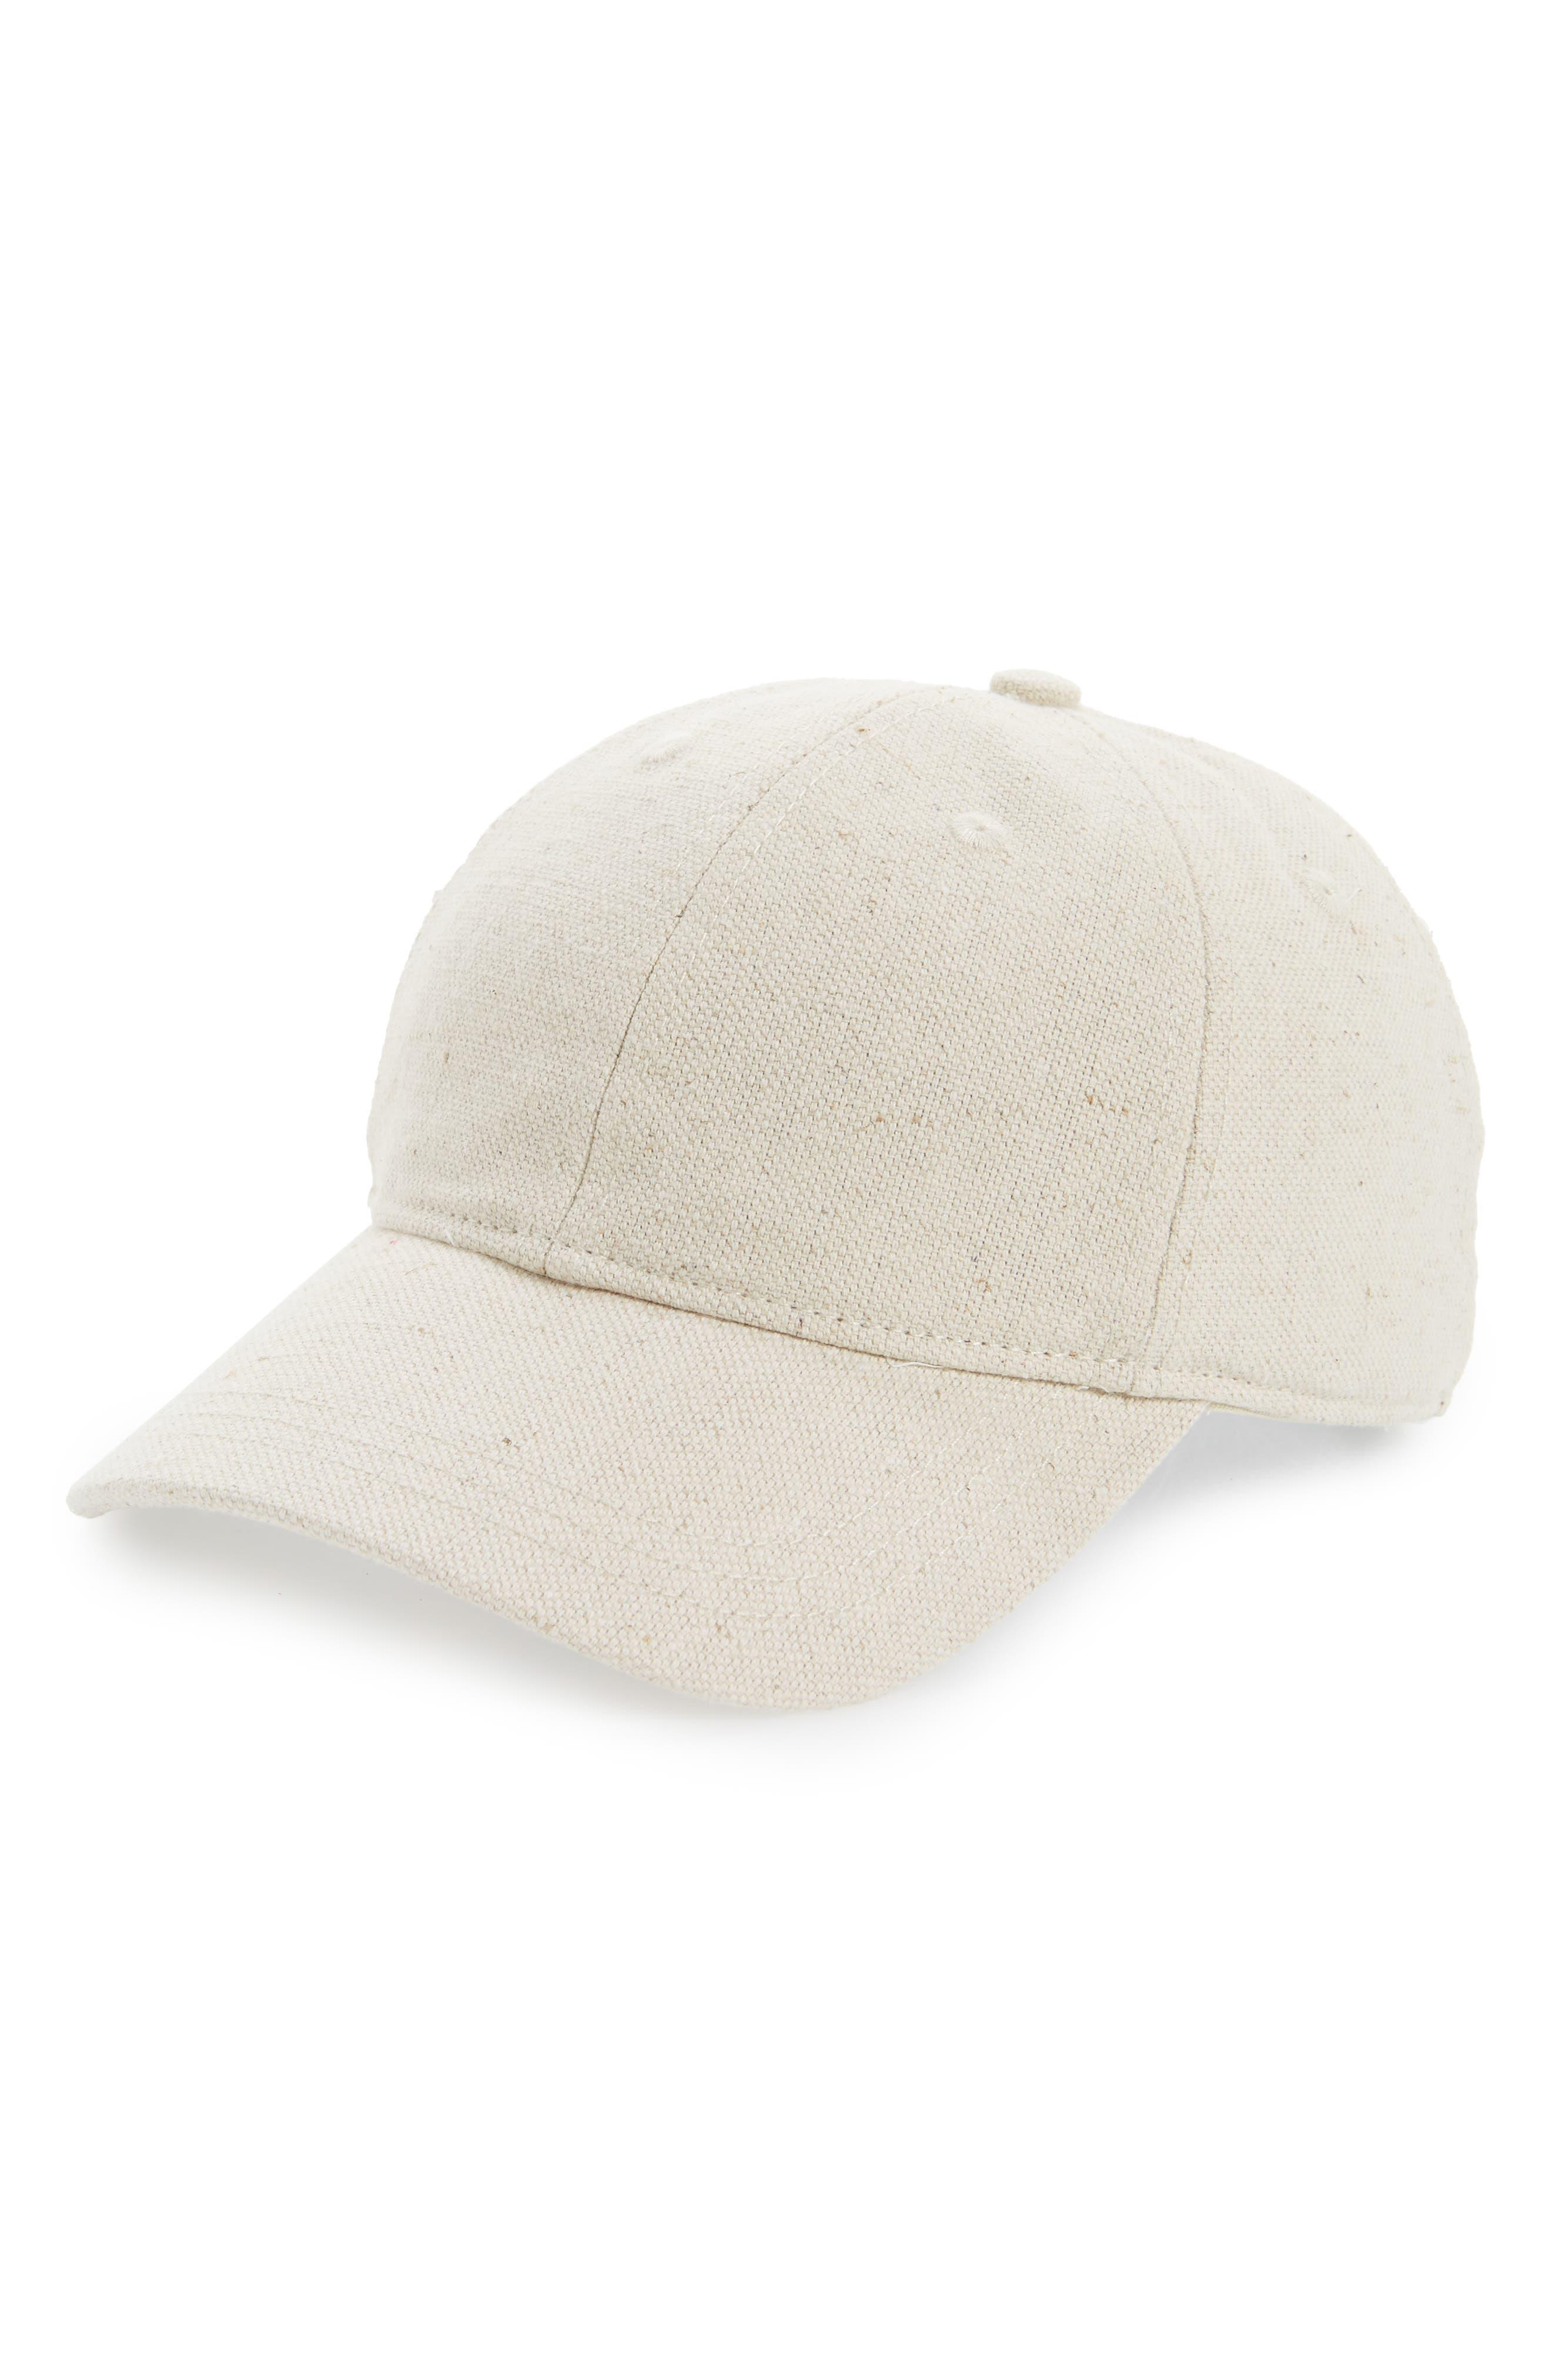 Cotton & Linen Baseball Cap,                             Main thumbnail 1, color,